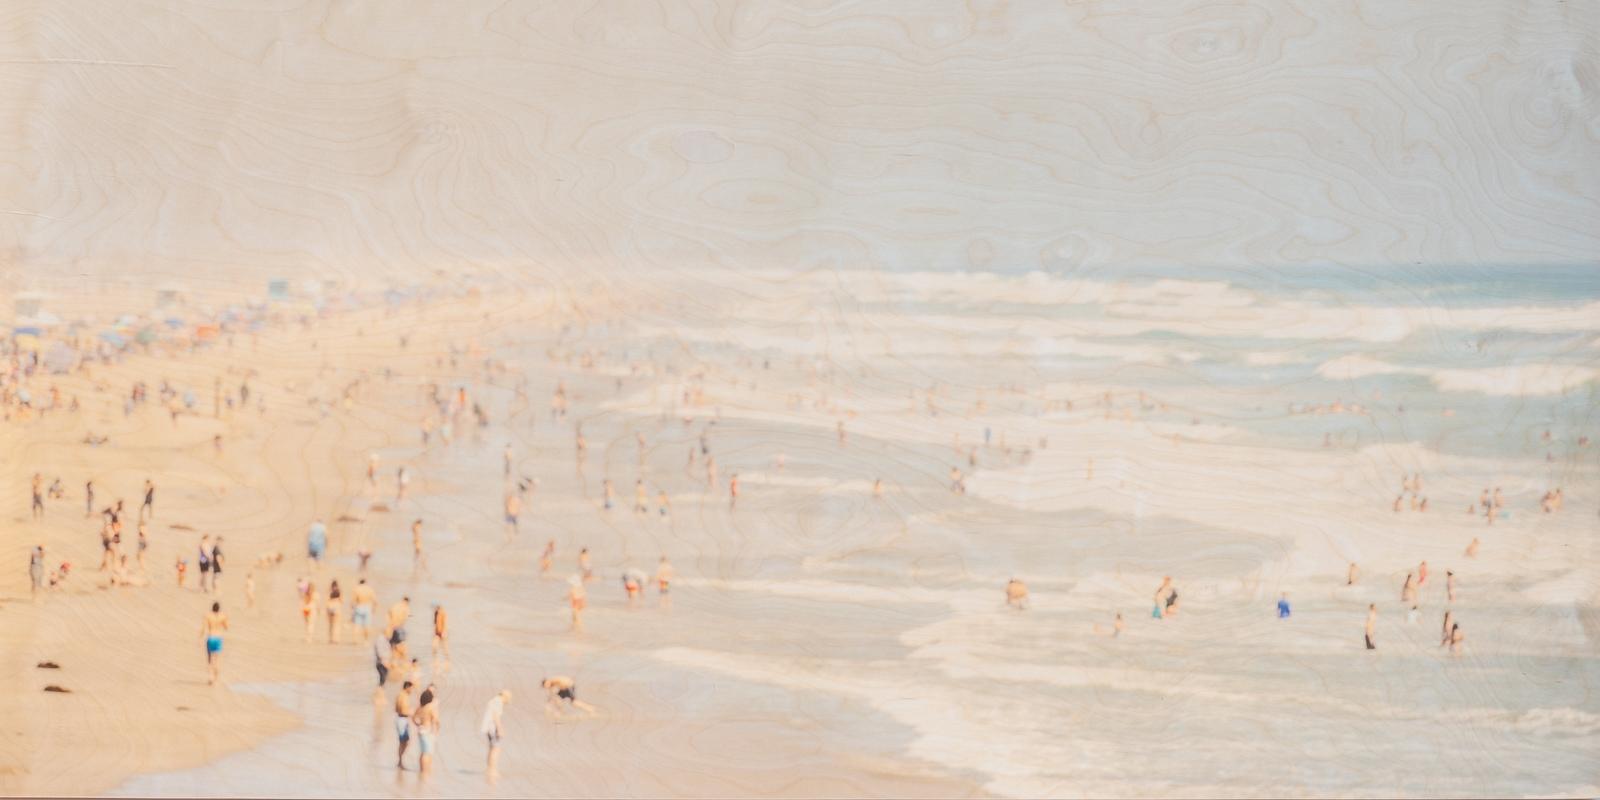 Summer Lovin' Panoramic  by Patrick Lajoie